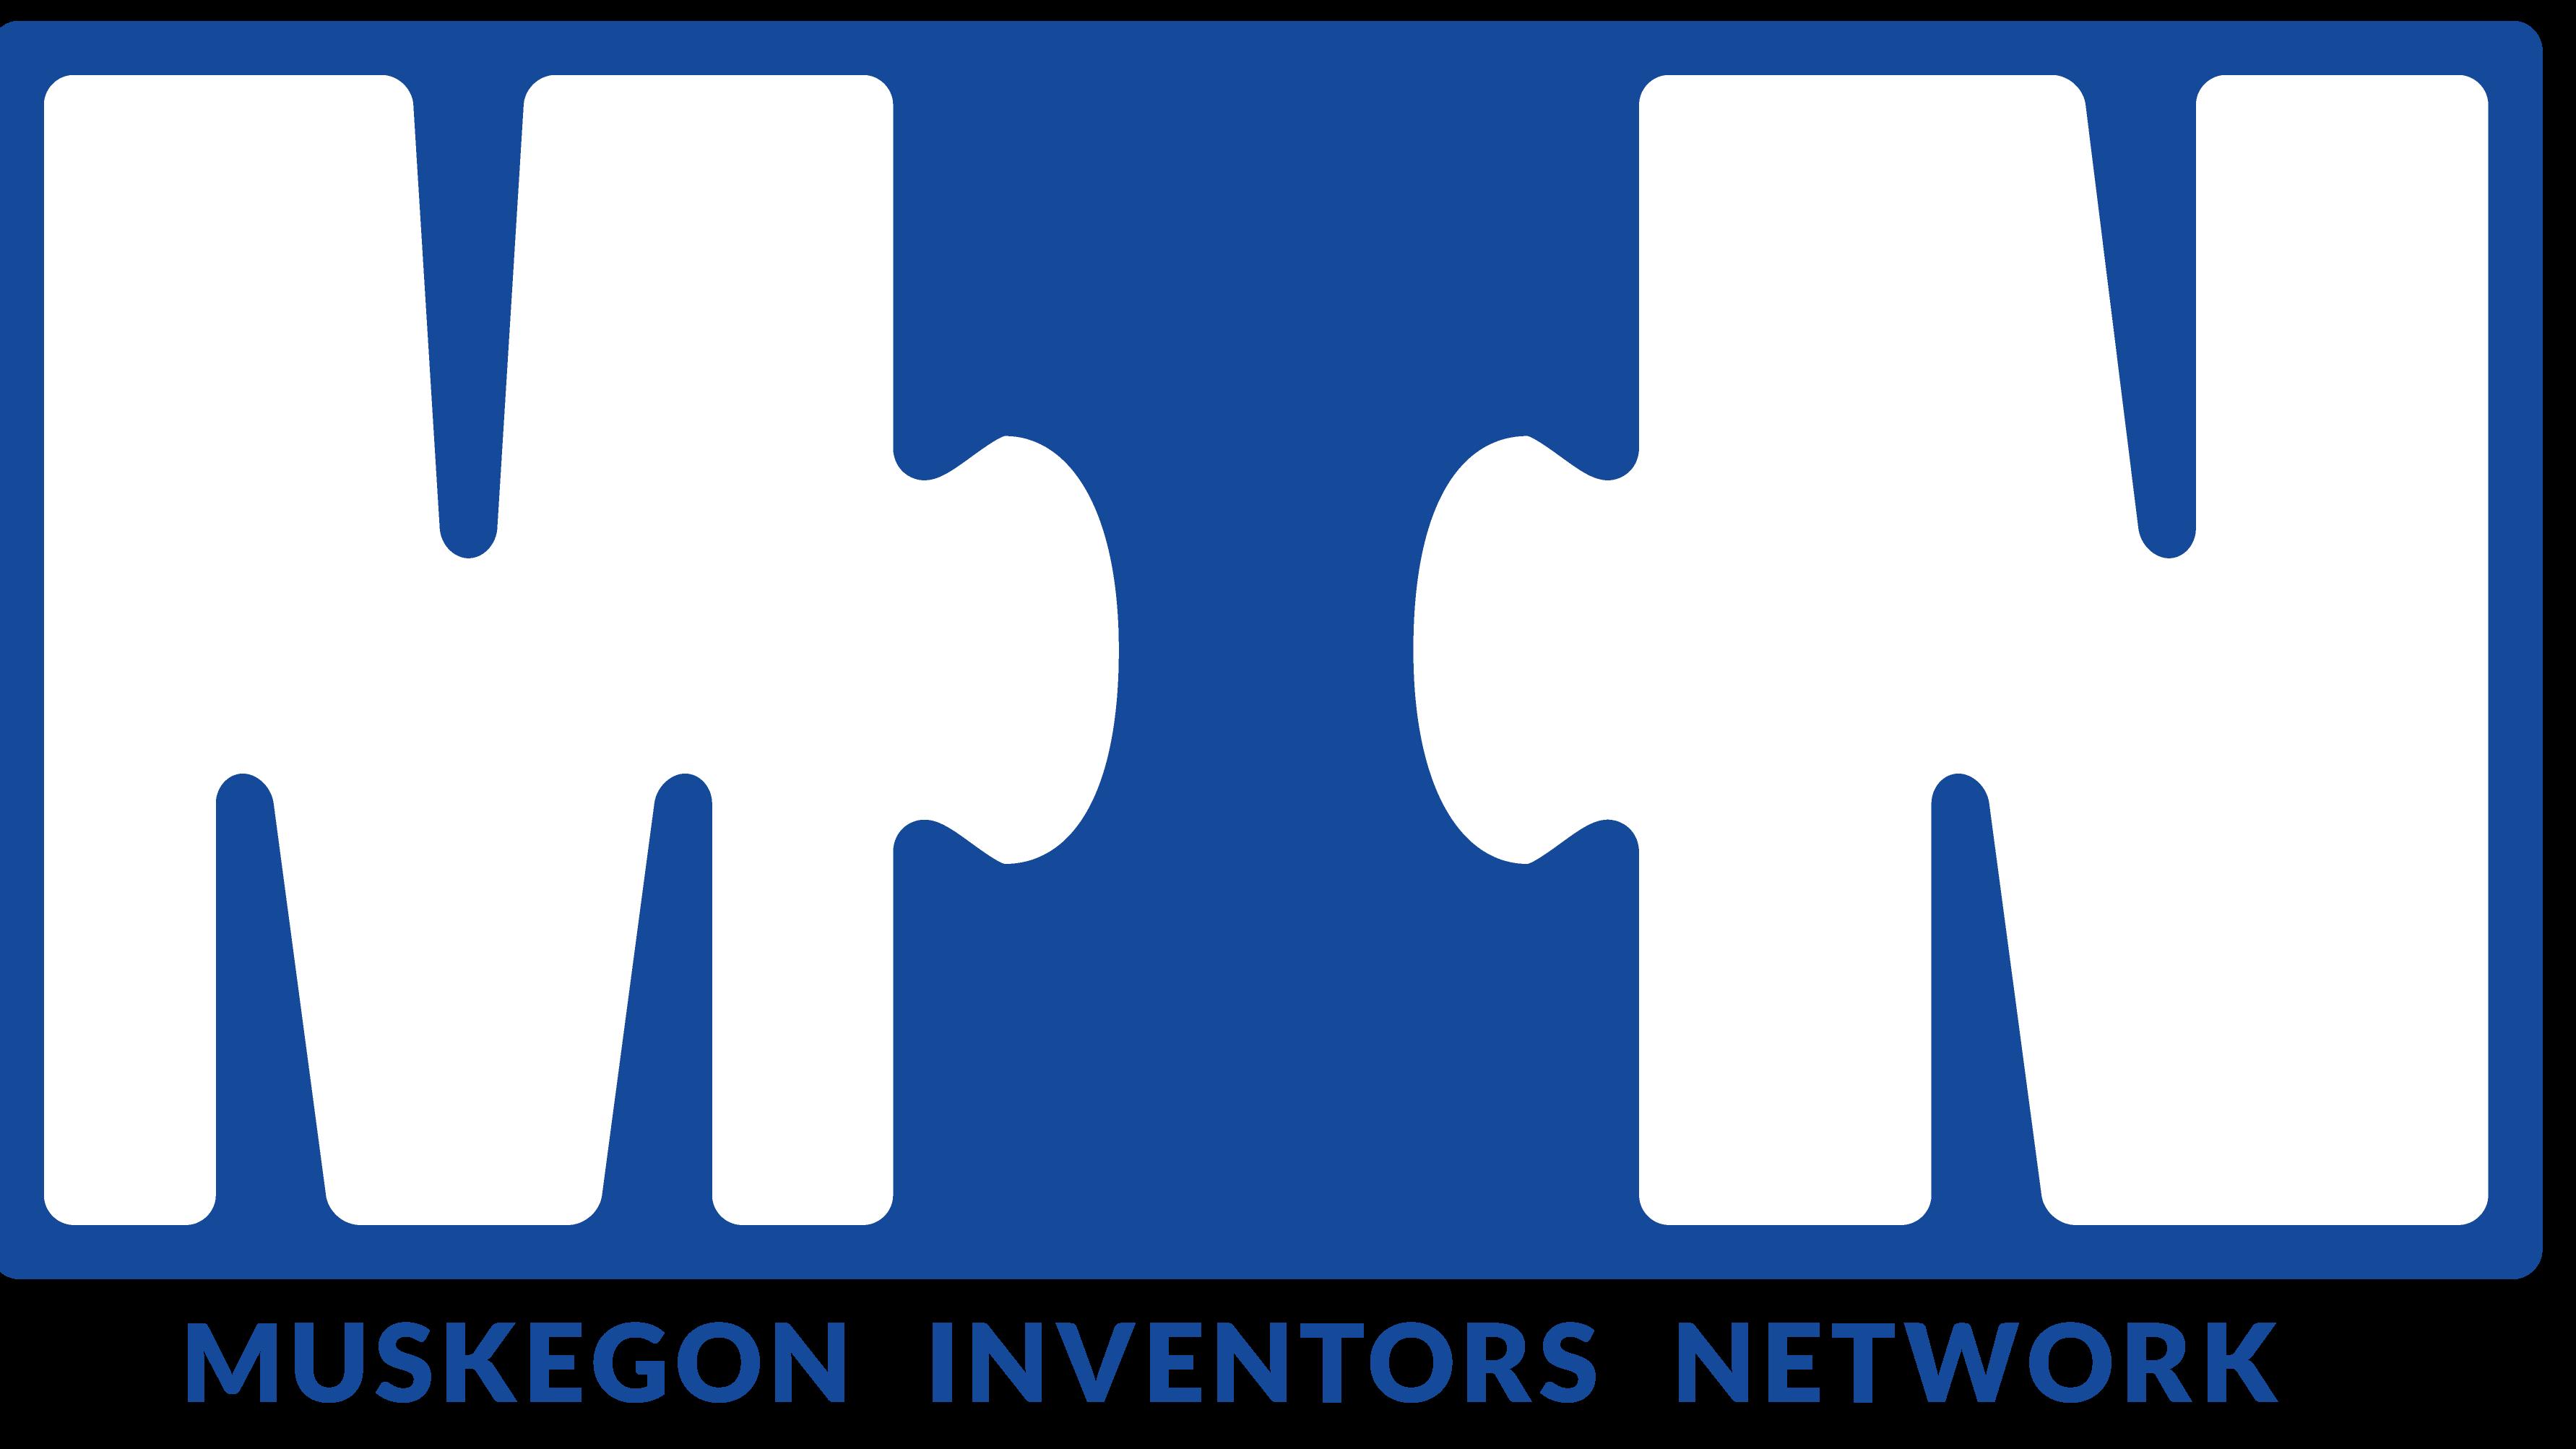 Muskegon Inventors Network